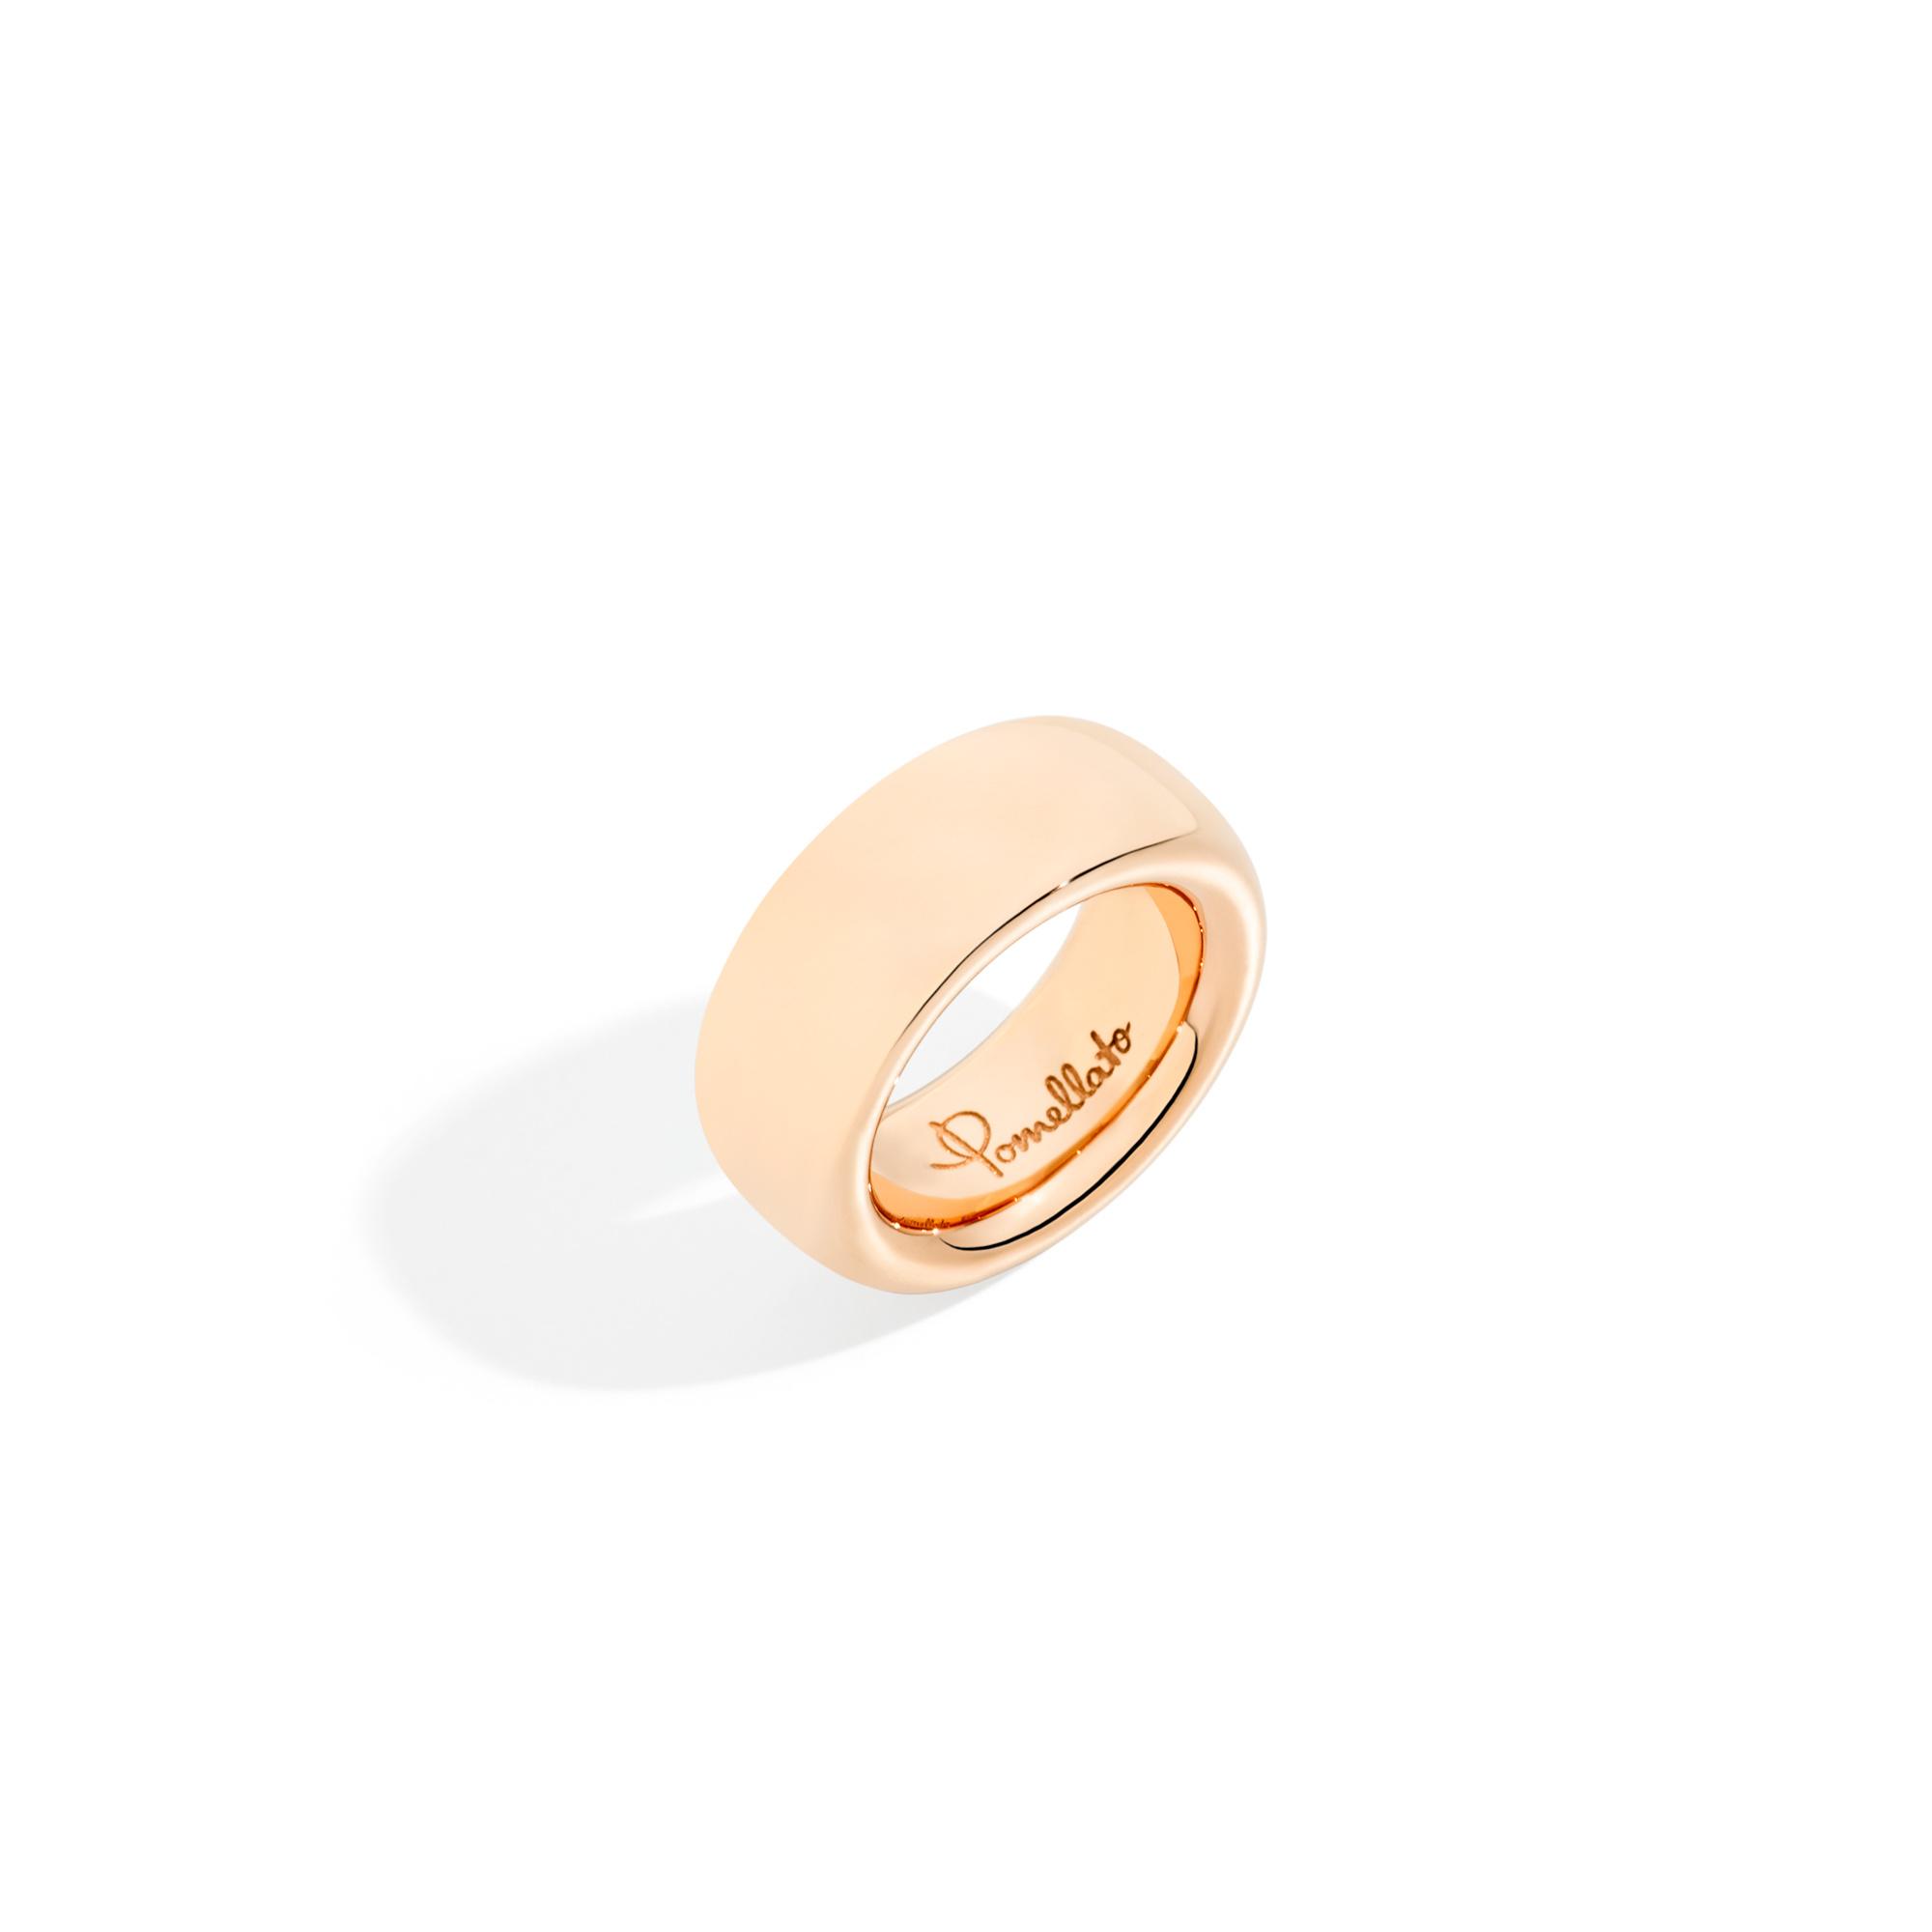 Pomellato Pomellato Iconica Rosegouden Ring Large 18k